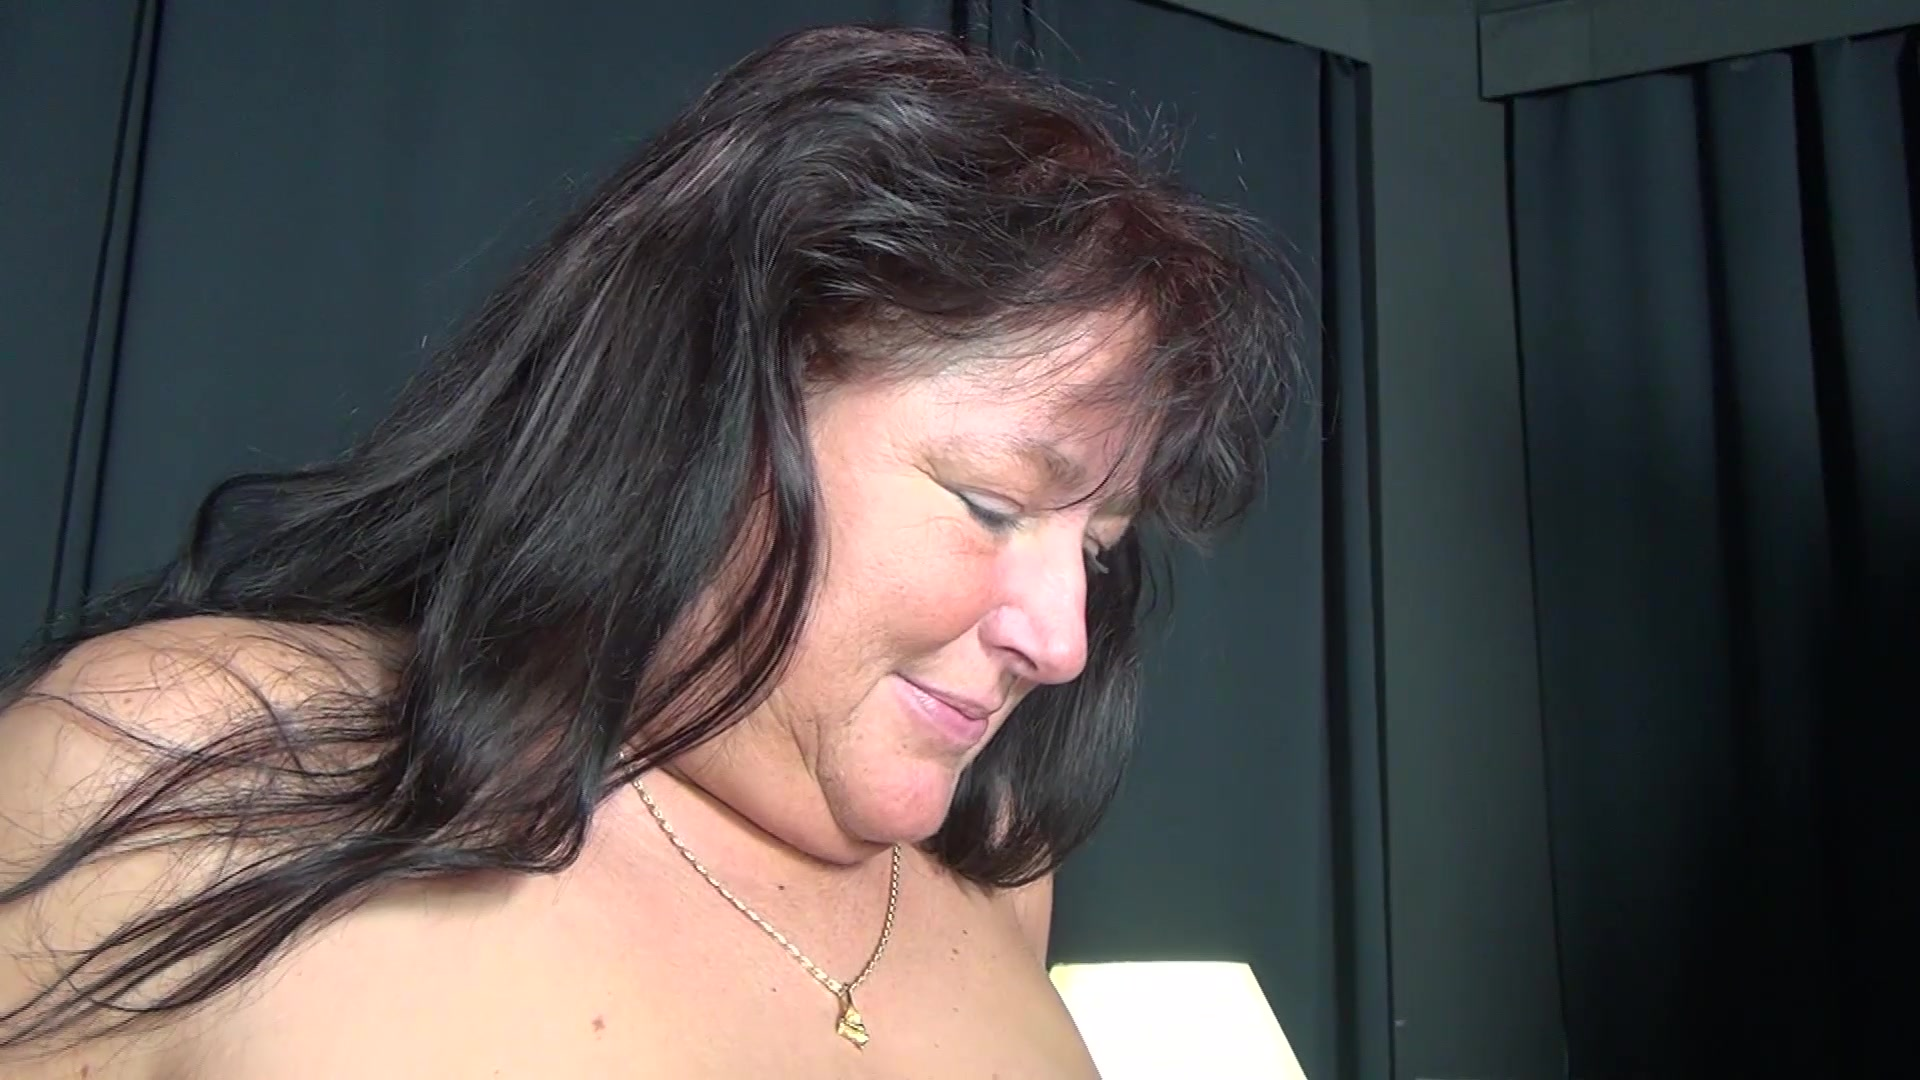 Gefragt nackt putz en pervers Perverse Luder